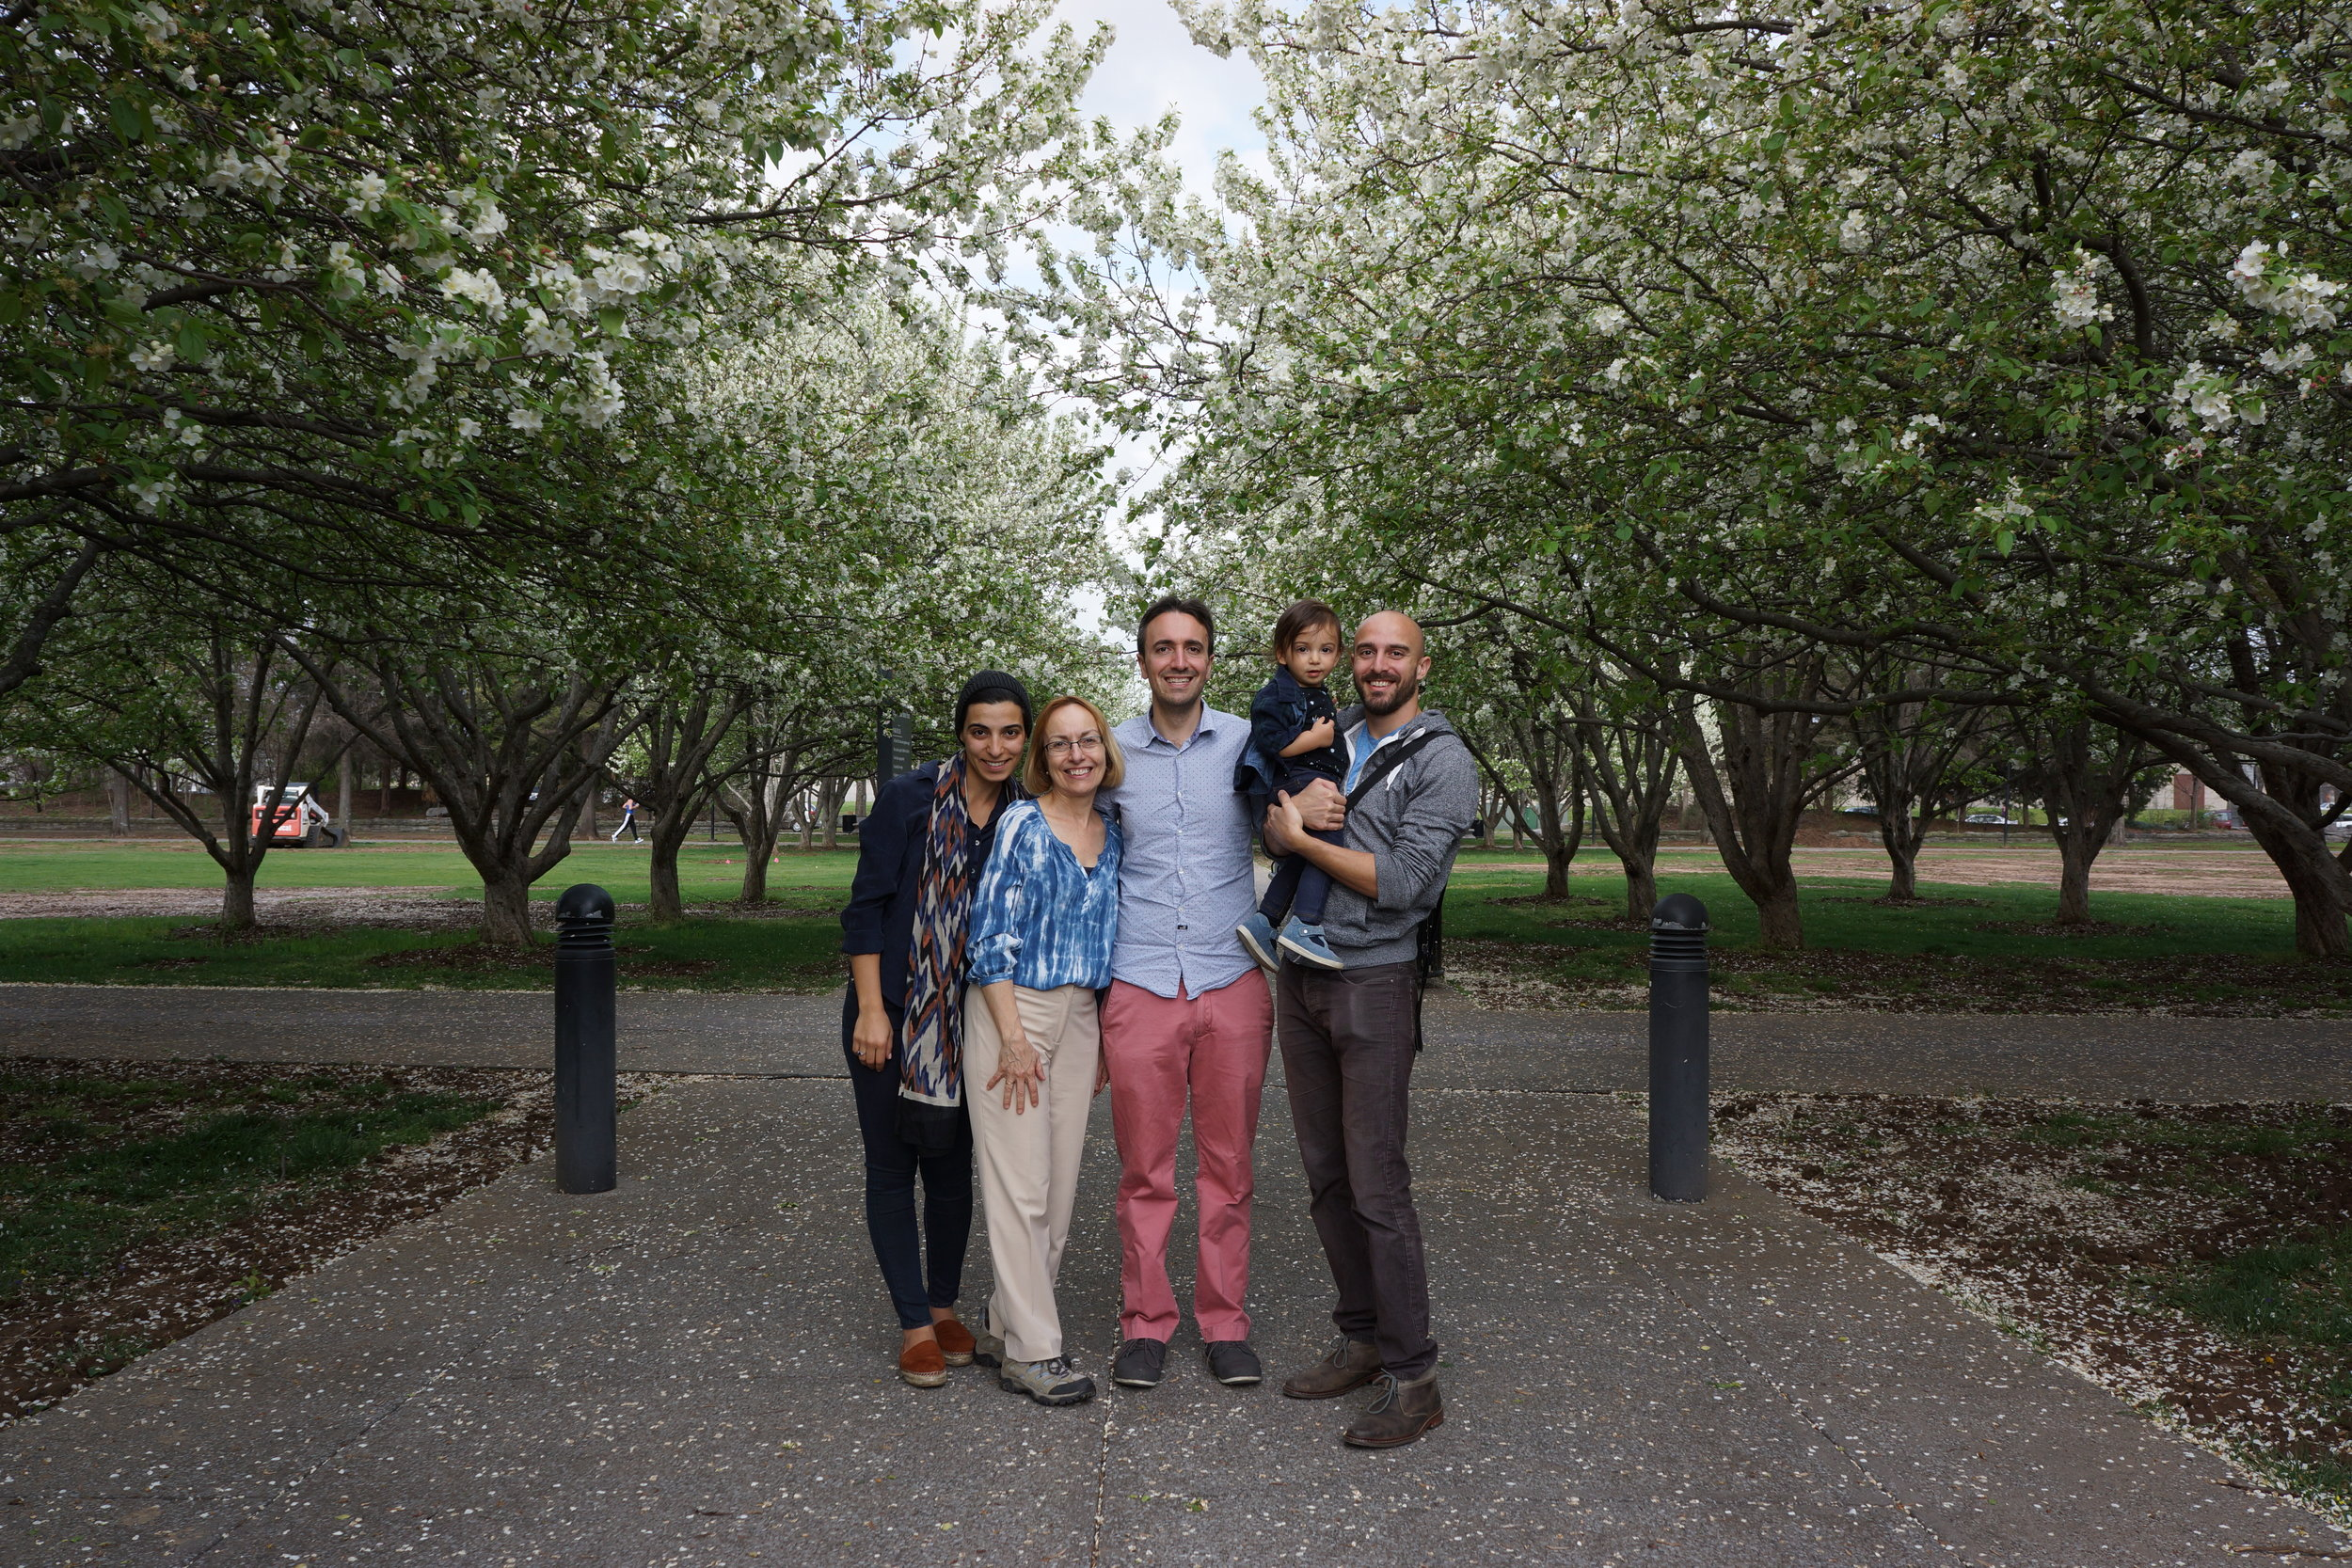 family photo - bicentennial park